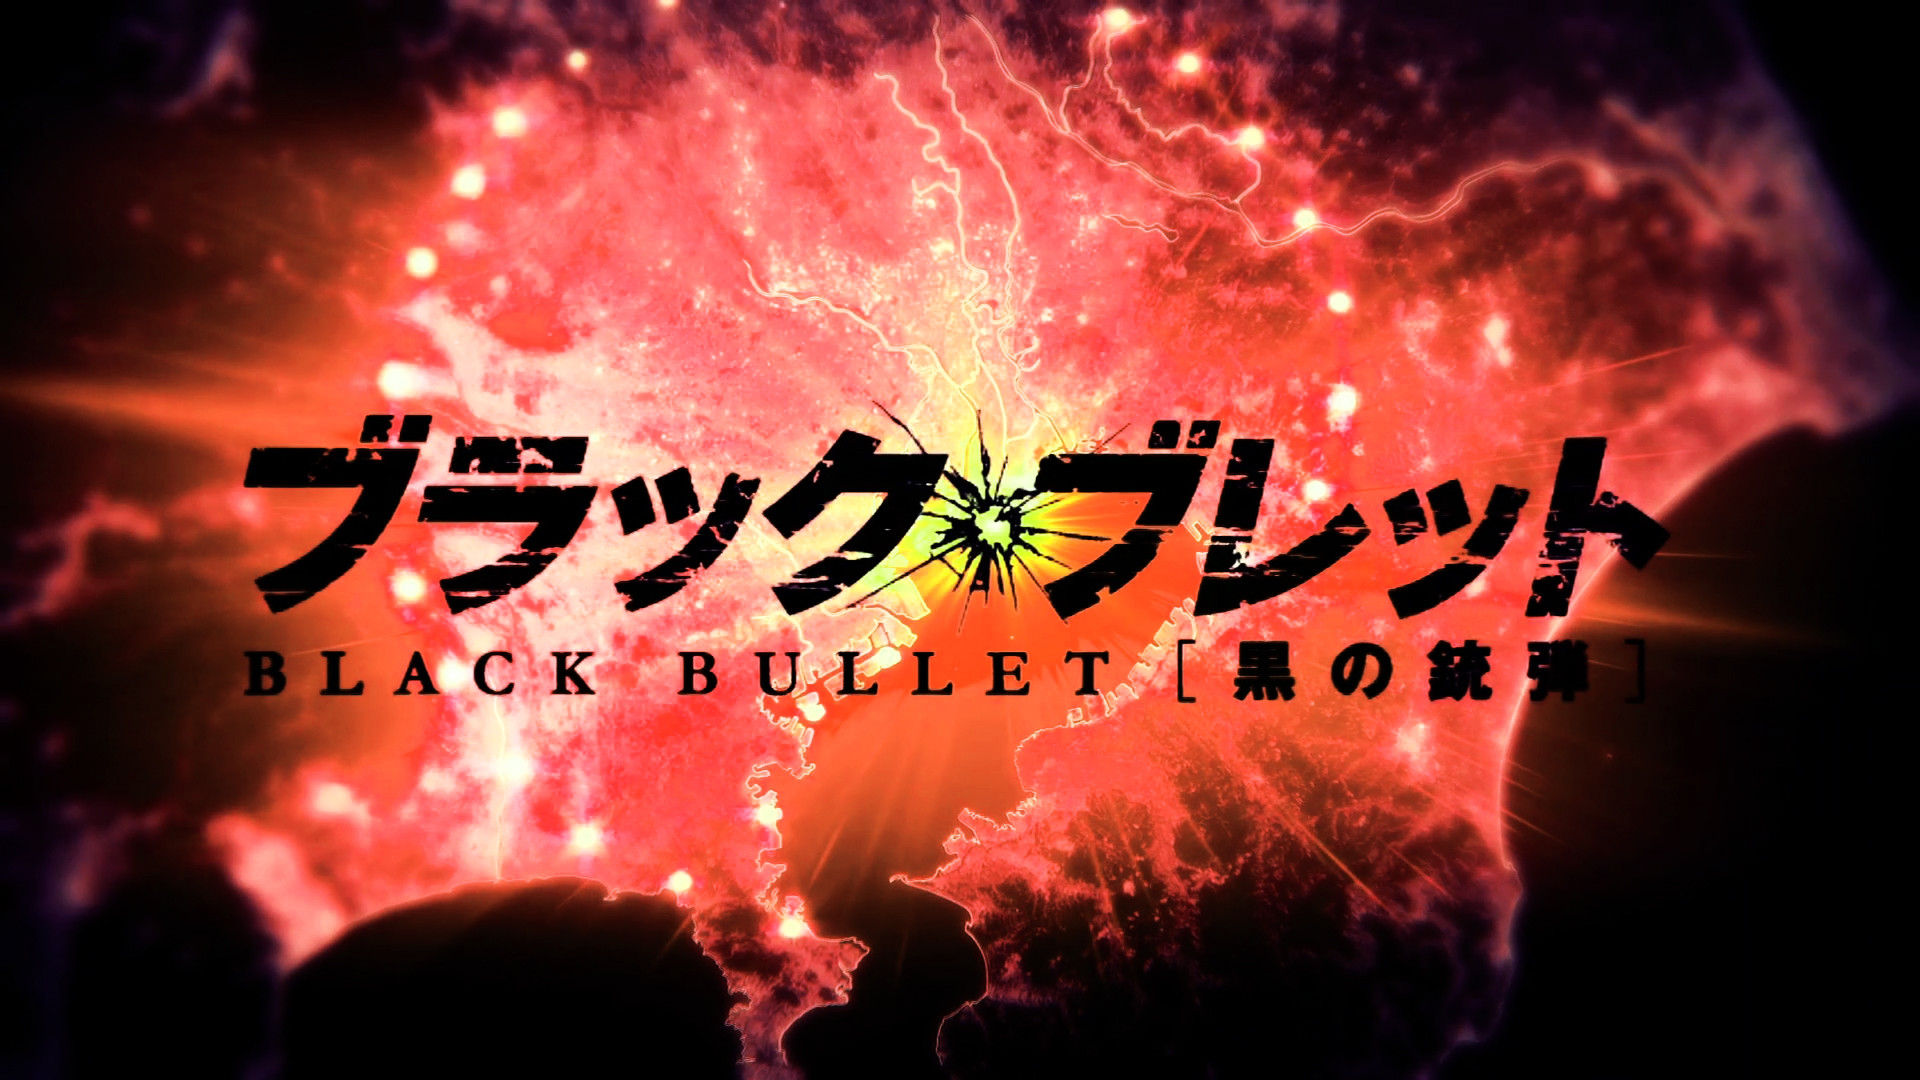 Black Bullet Wallpapers 77 Images